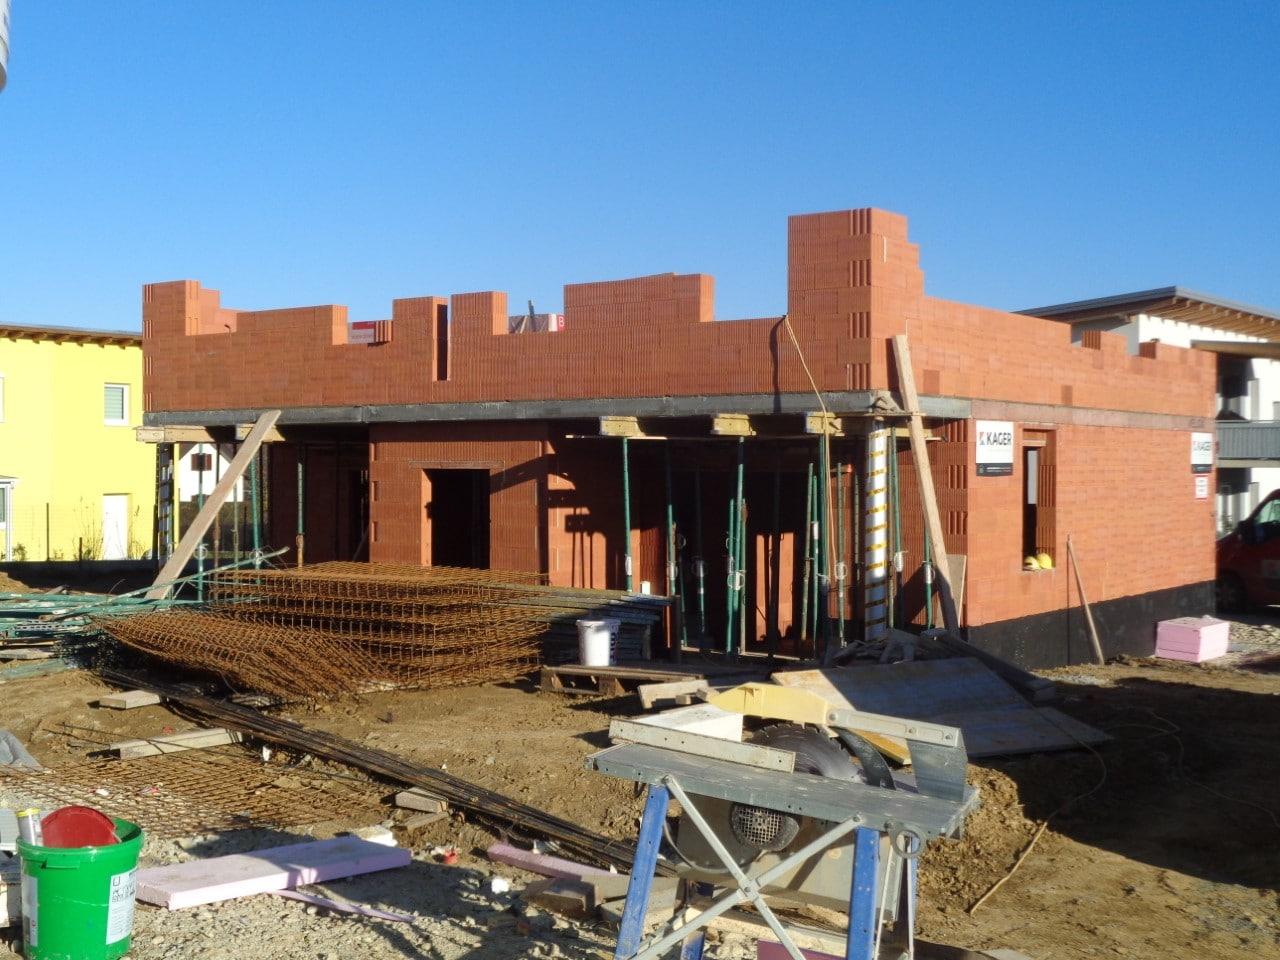 Neubau Doppelwohnhaus in Hartberg dank der Neubau-Baufirma Kager Bau